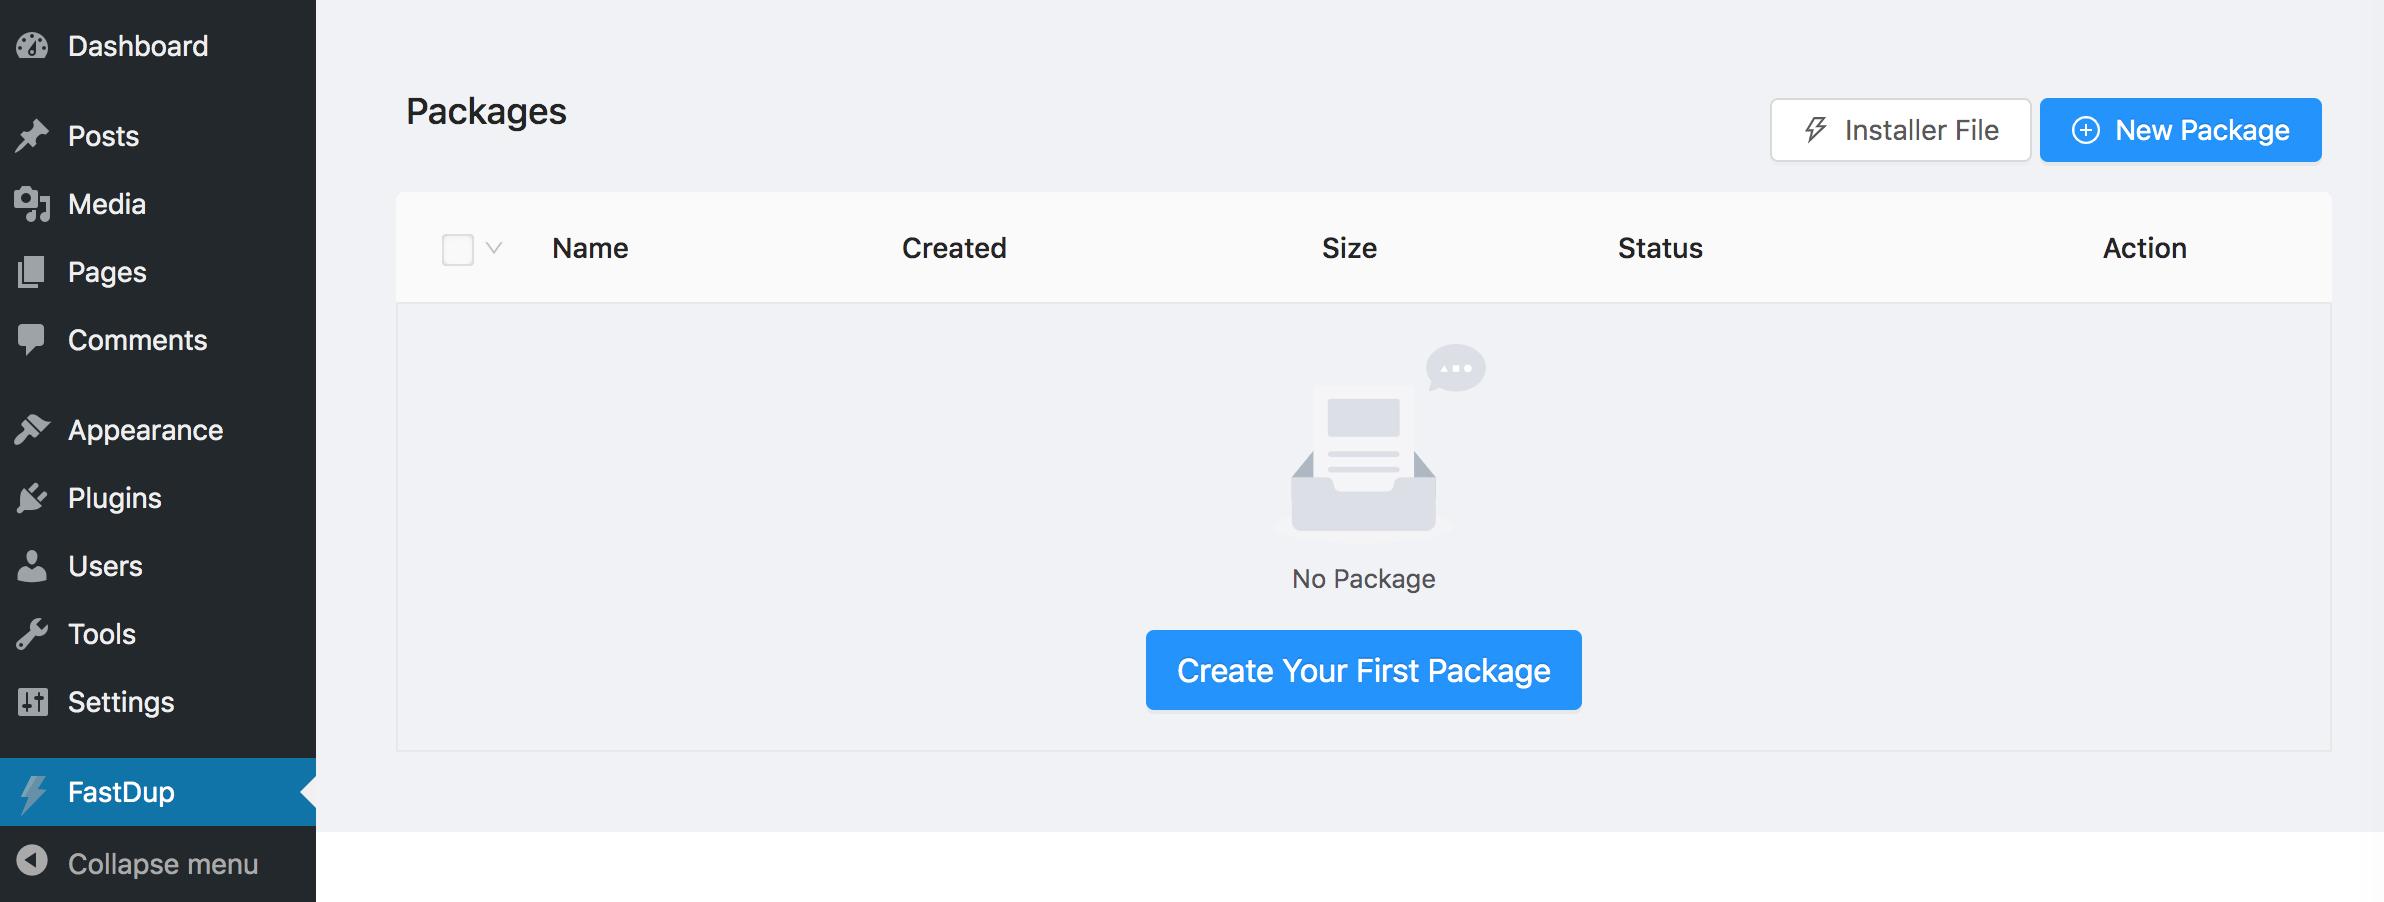 fastdup-duplicate-wordpress-migration